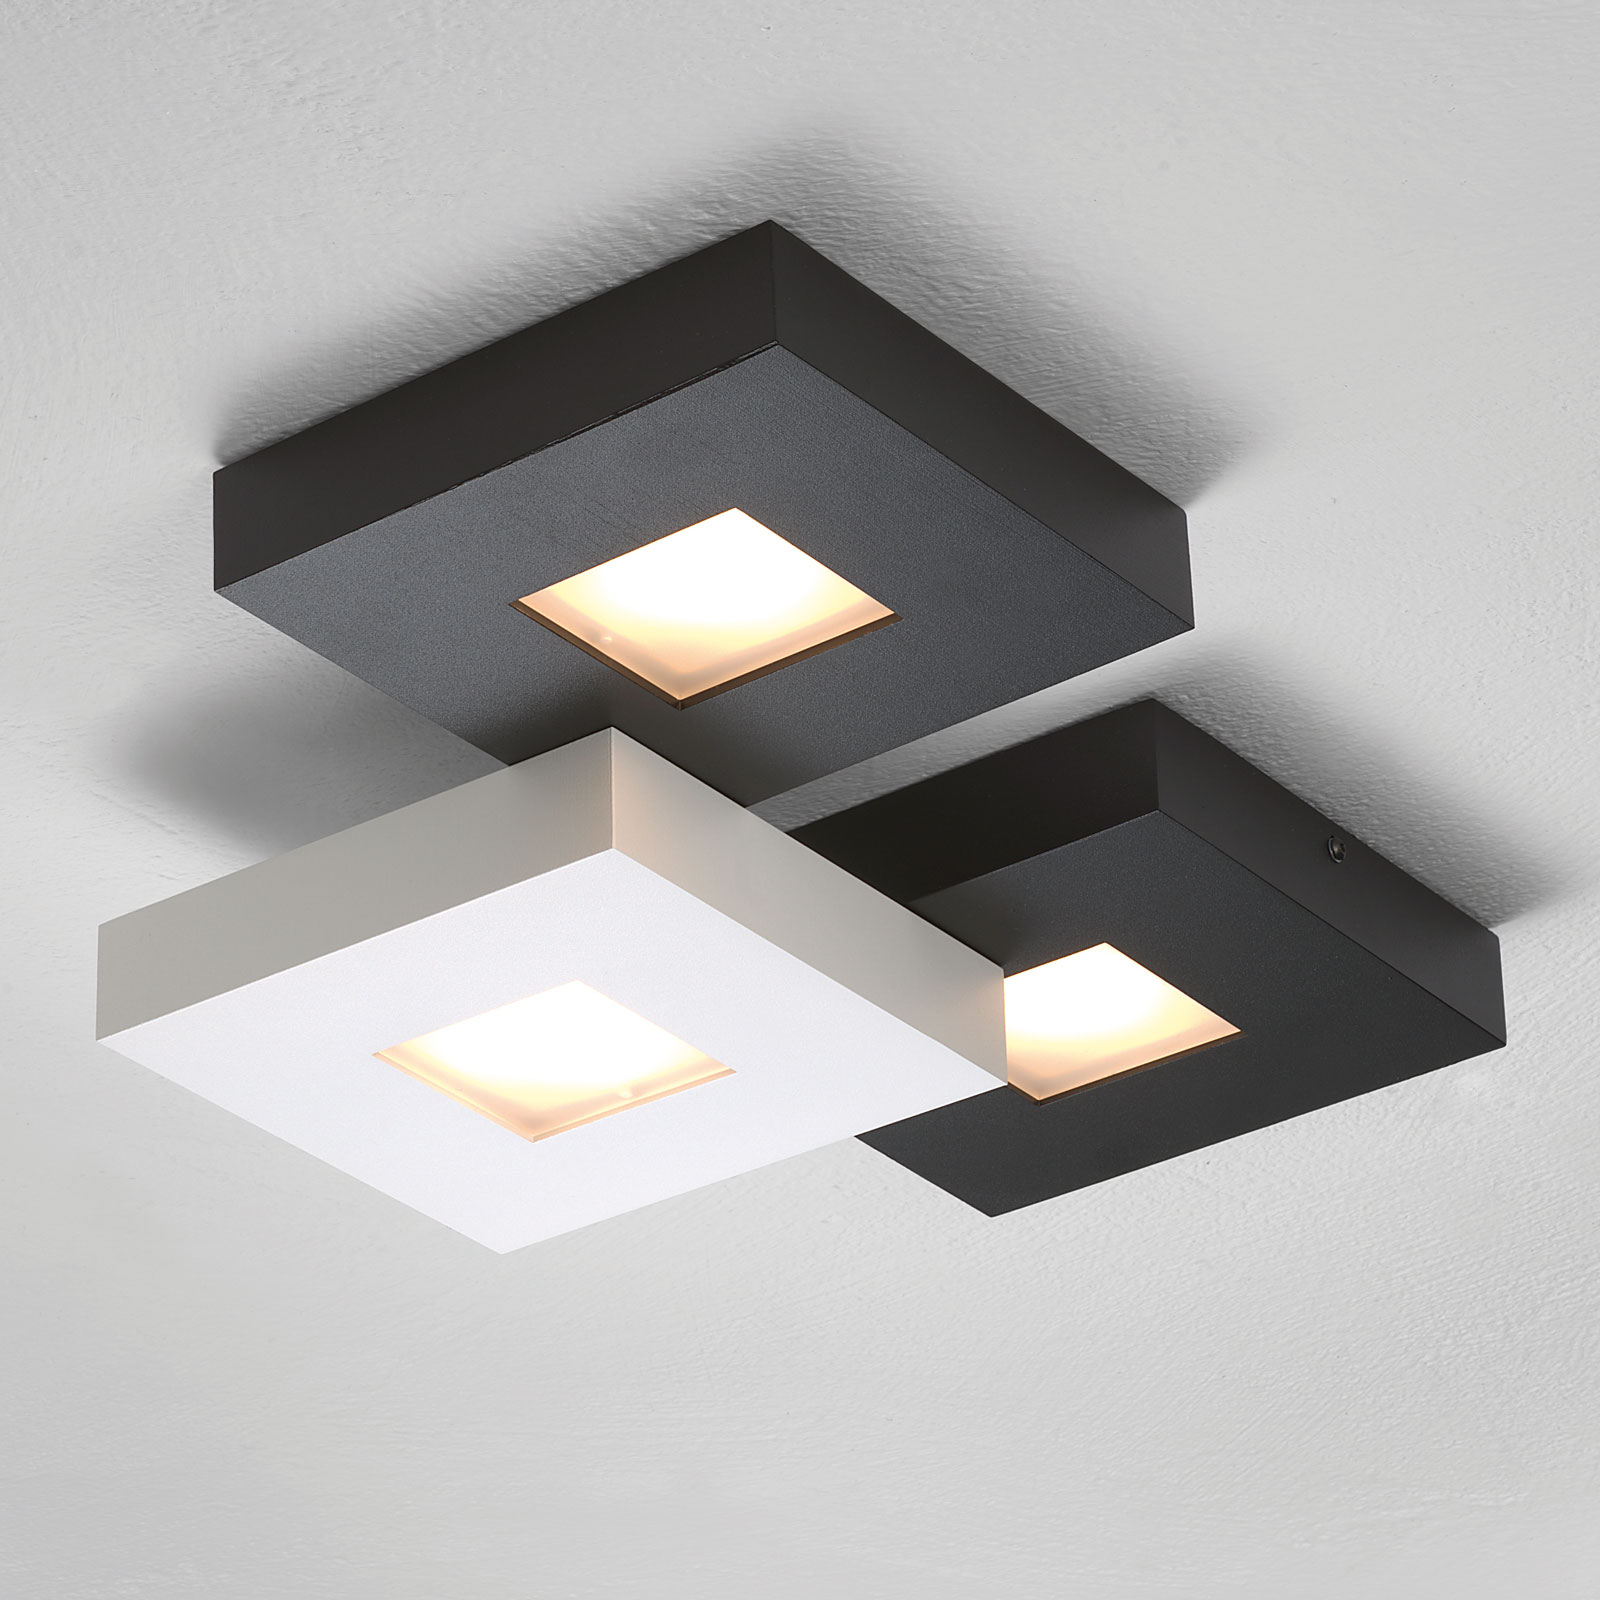 Bopp Cubus 3-flammige LED-Deckenlampe, schwarzweiß